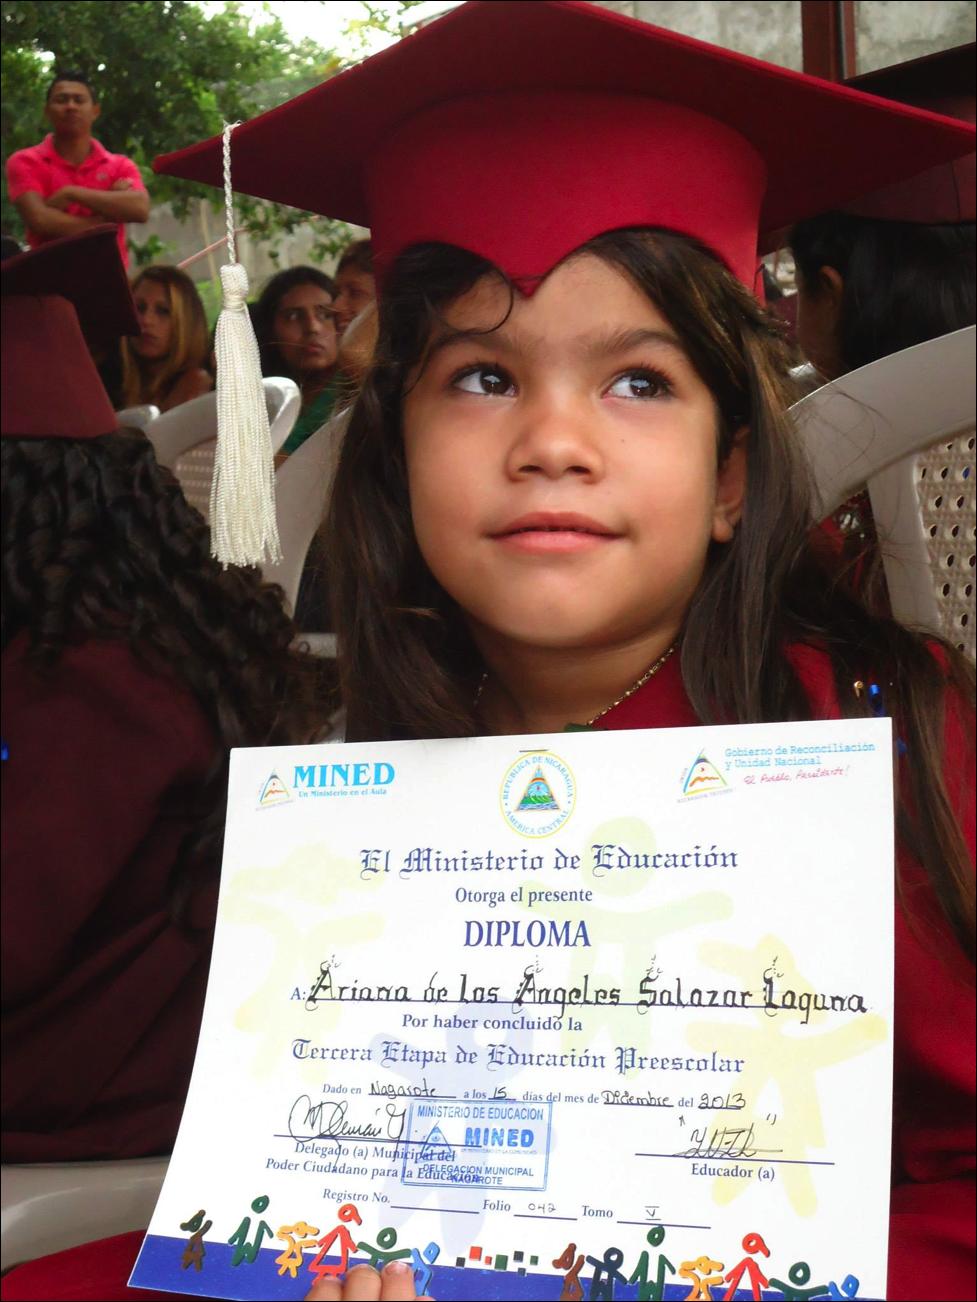 $50 GIFT - Provides One full Year Preschool Scholarship